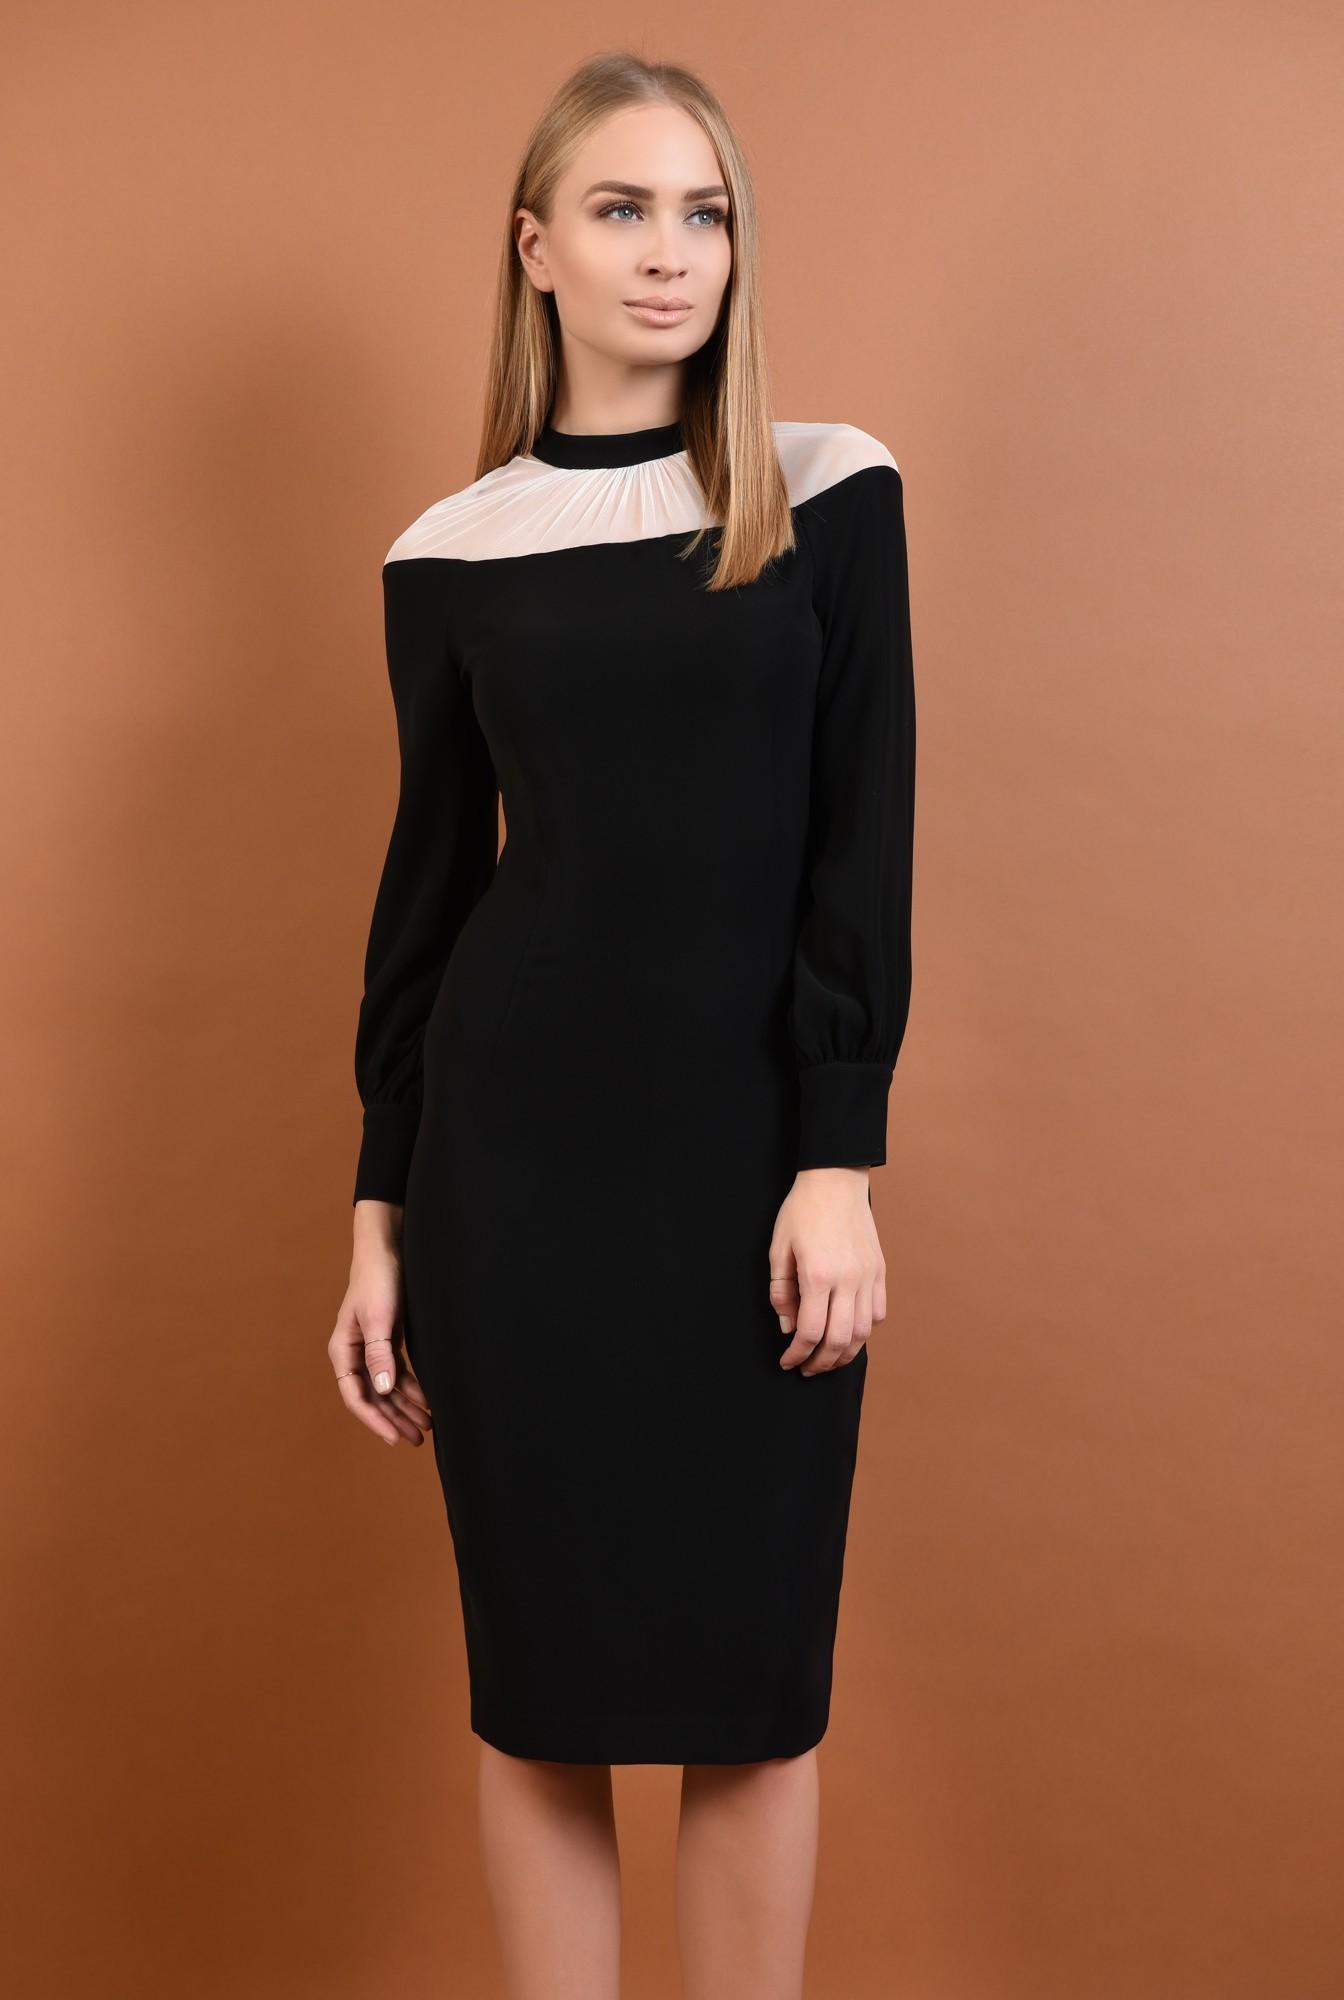 0 - 360 - rochie eleganta, midi, conica, neagra, insertie tul, nasturi metalici